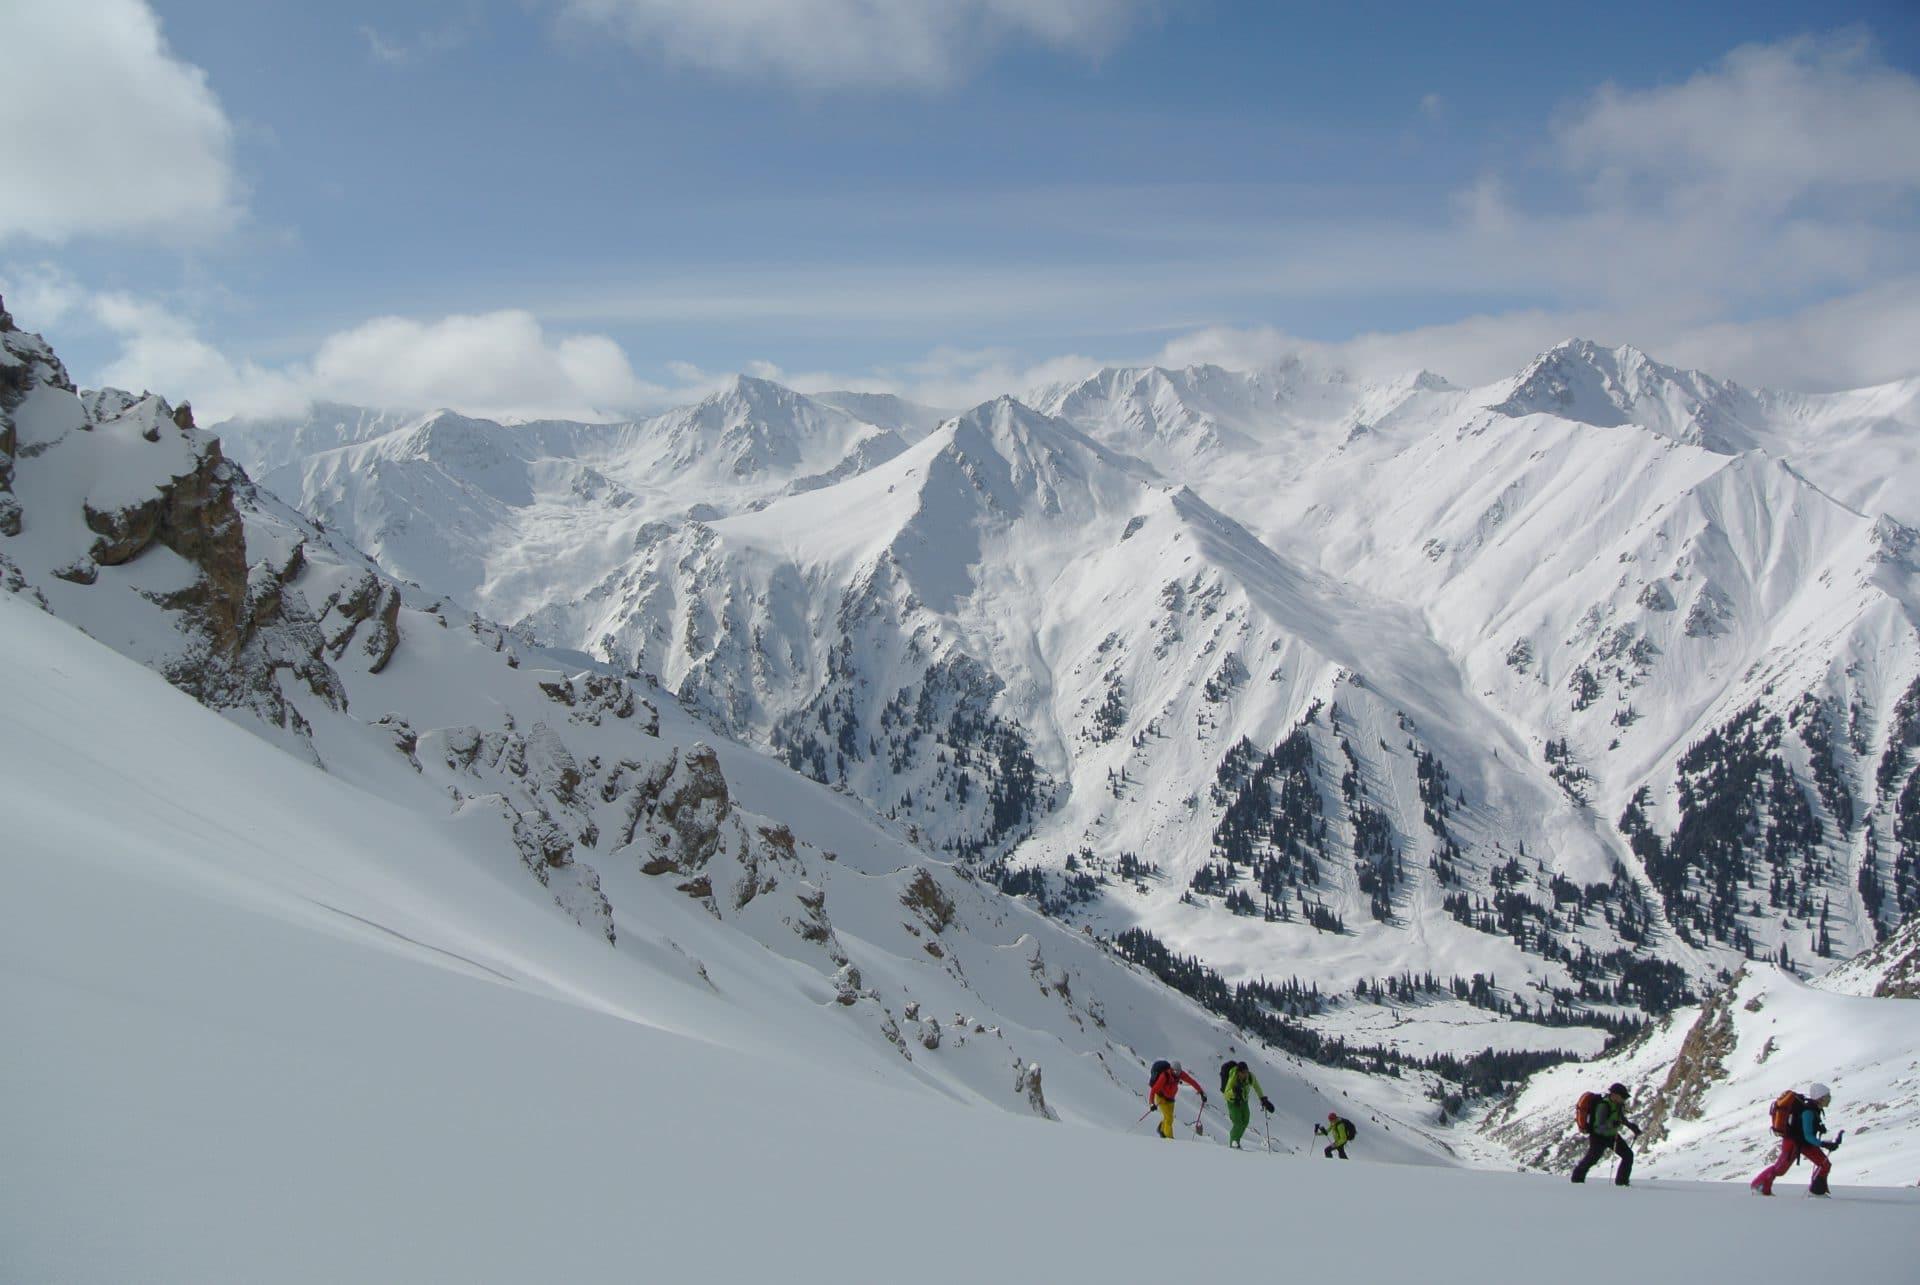 Helyum_Xavier-Carrard_Guide-de-montagne_Ski_Voyage_Kirghistan_Asie-Centrale_Ambiance